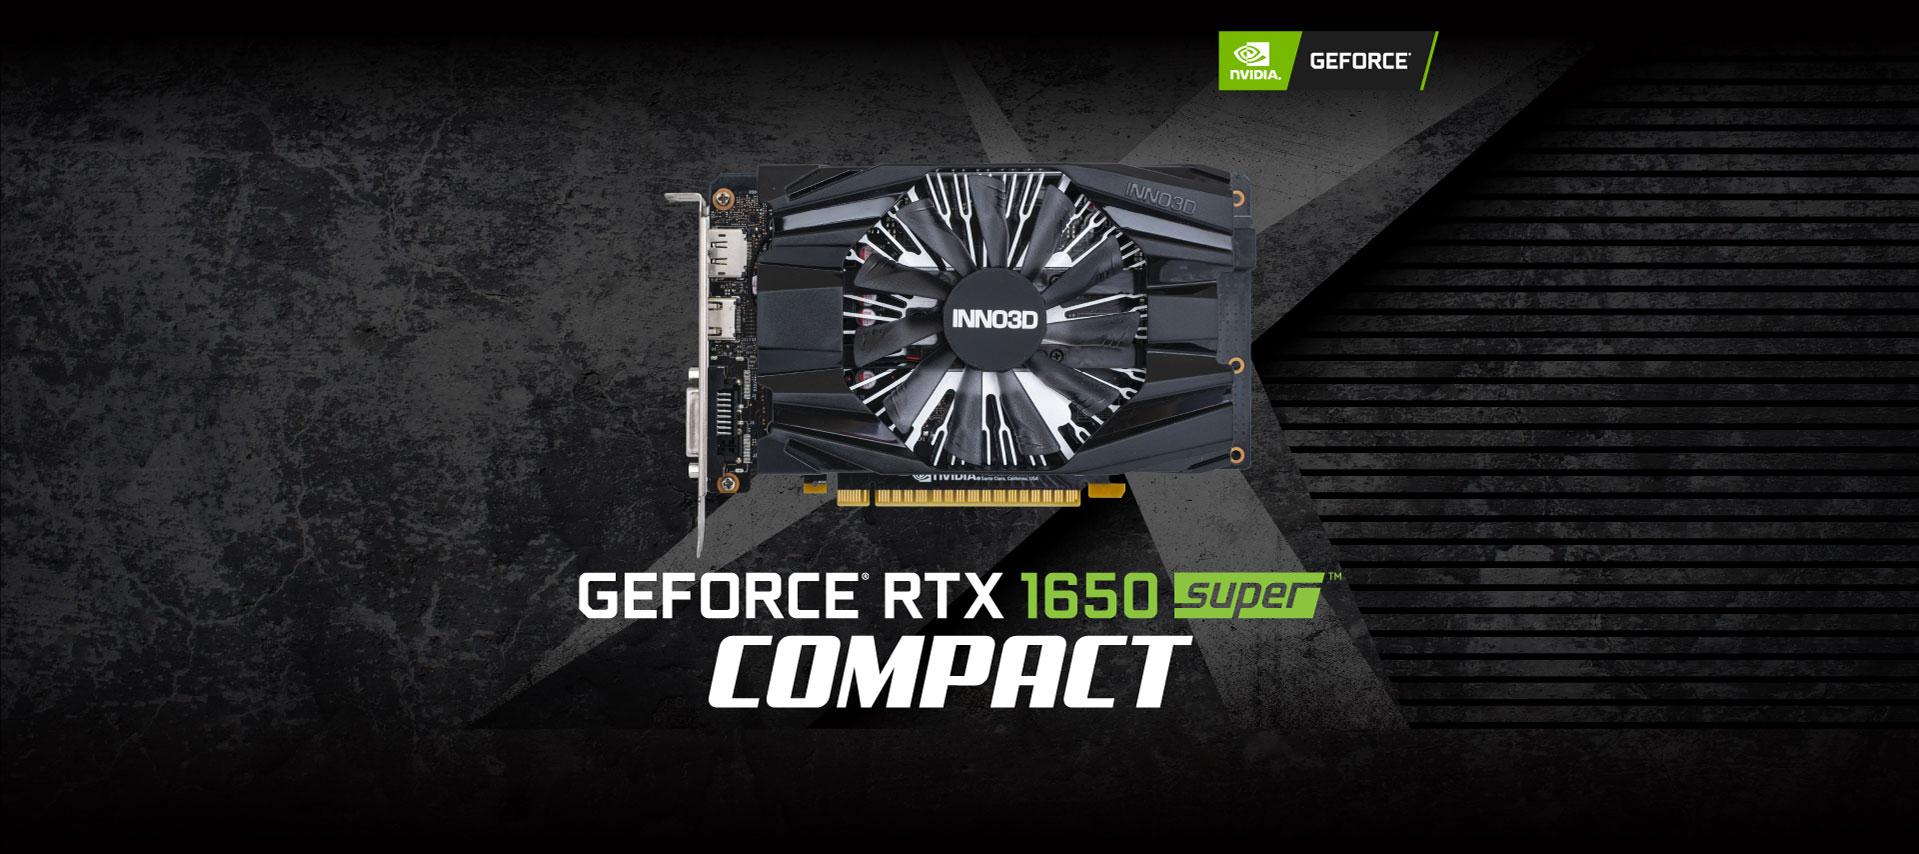 1650_Super_Compact_1920w_01.jpg (263 KB)